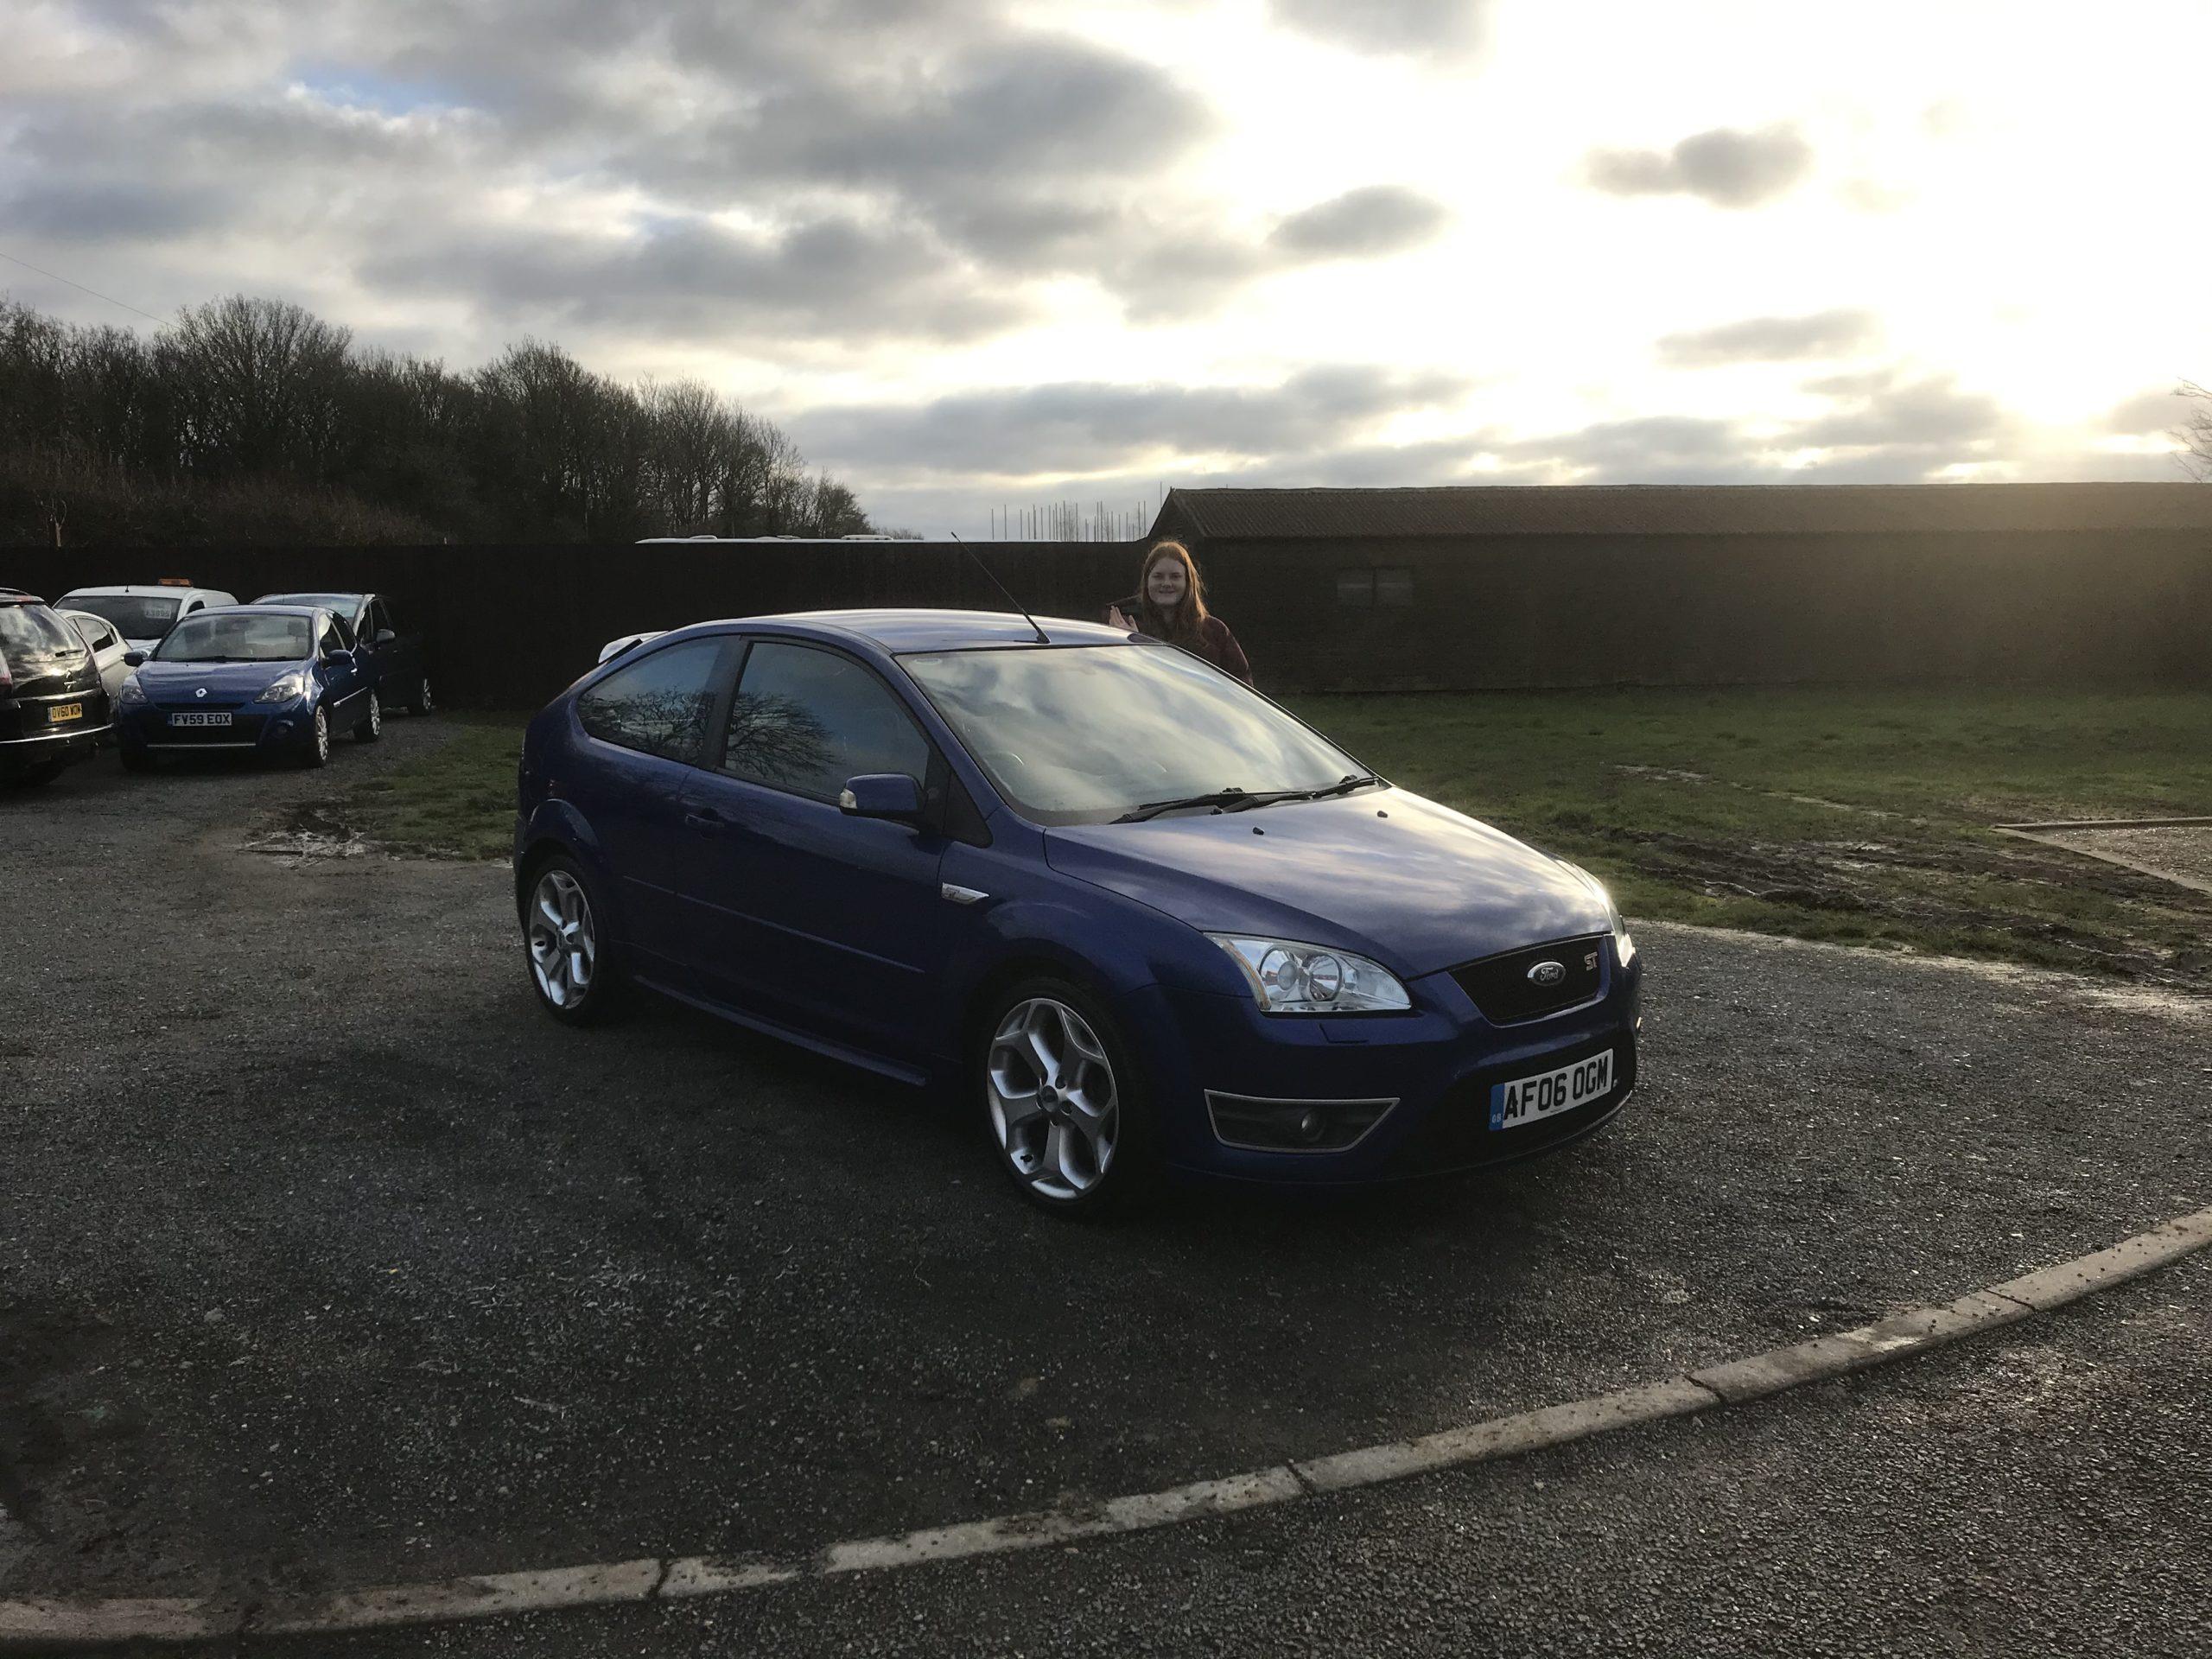 Ford Focus 2.5 St-2 (06 Reg) – £3595